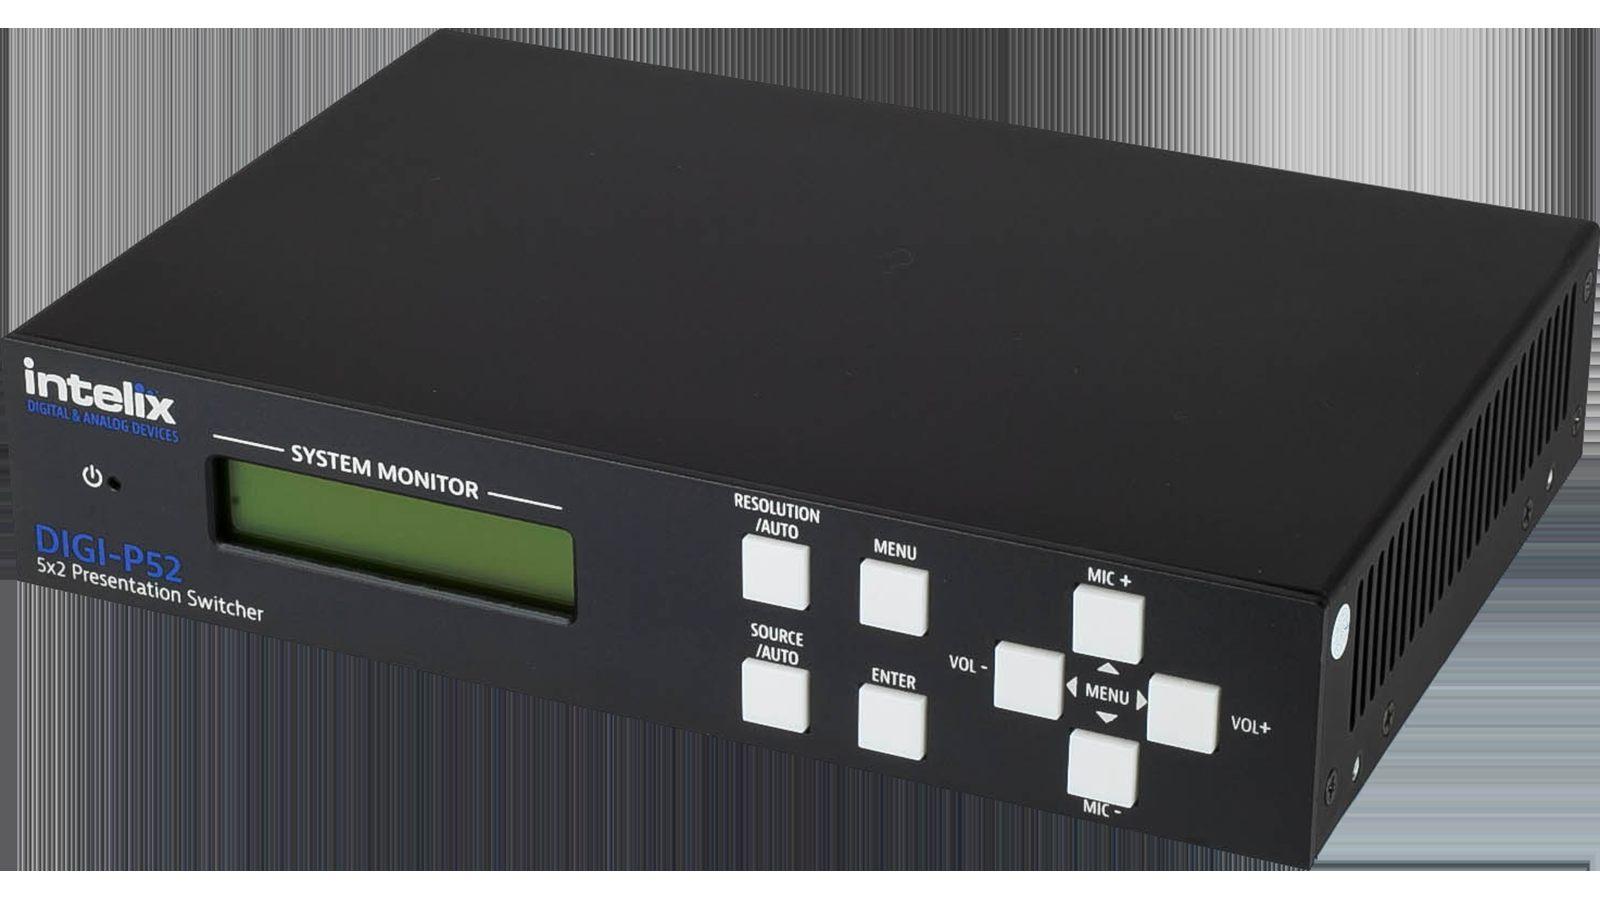 Lit Bébé Transportable Impressionnant Digi P52 Bstk Presentation Switcher 5 Input X 2 Output